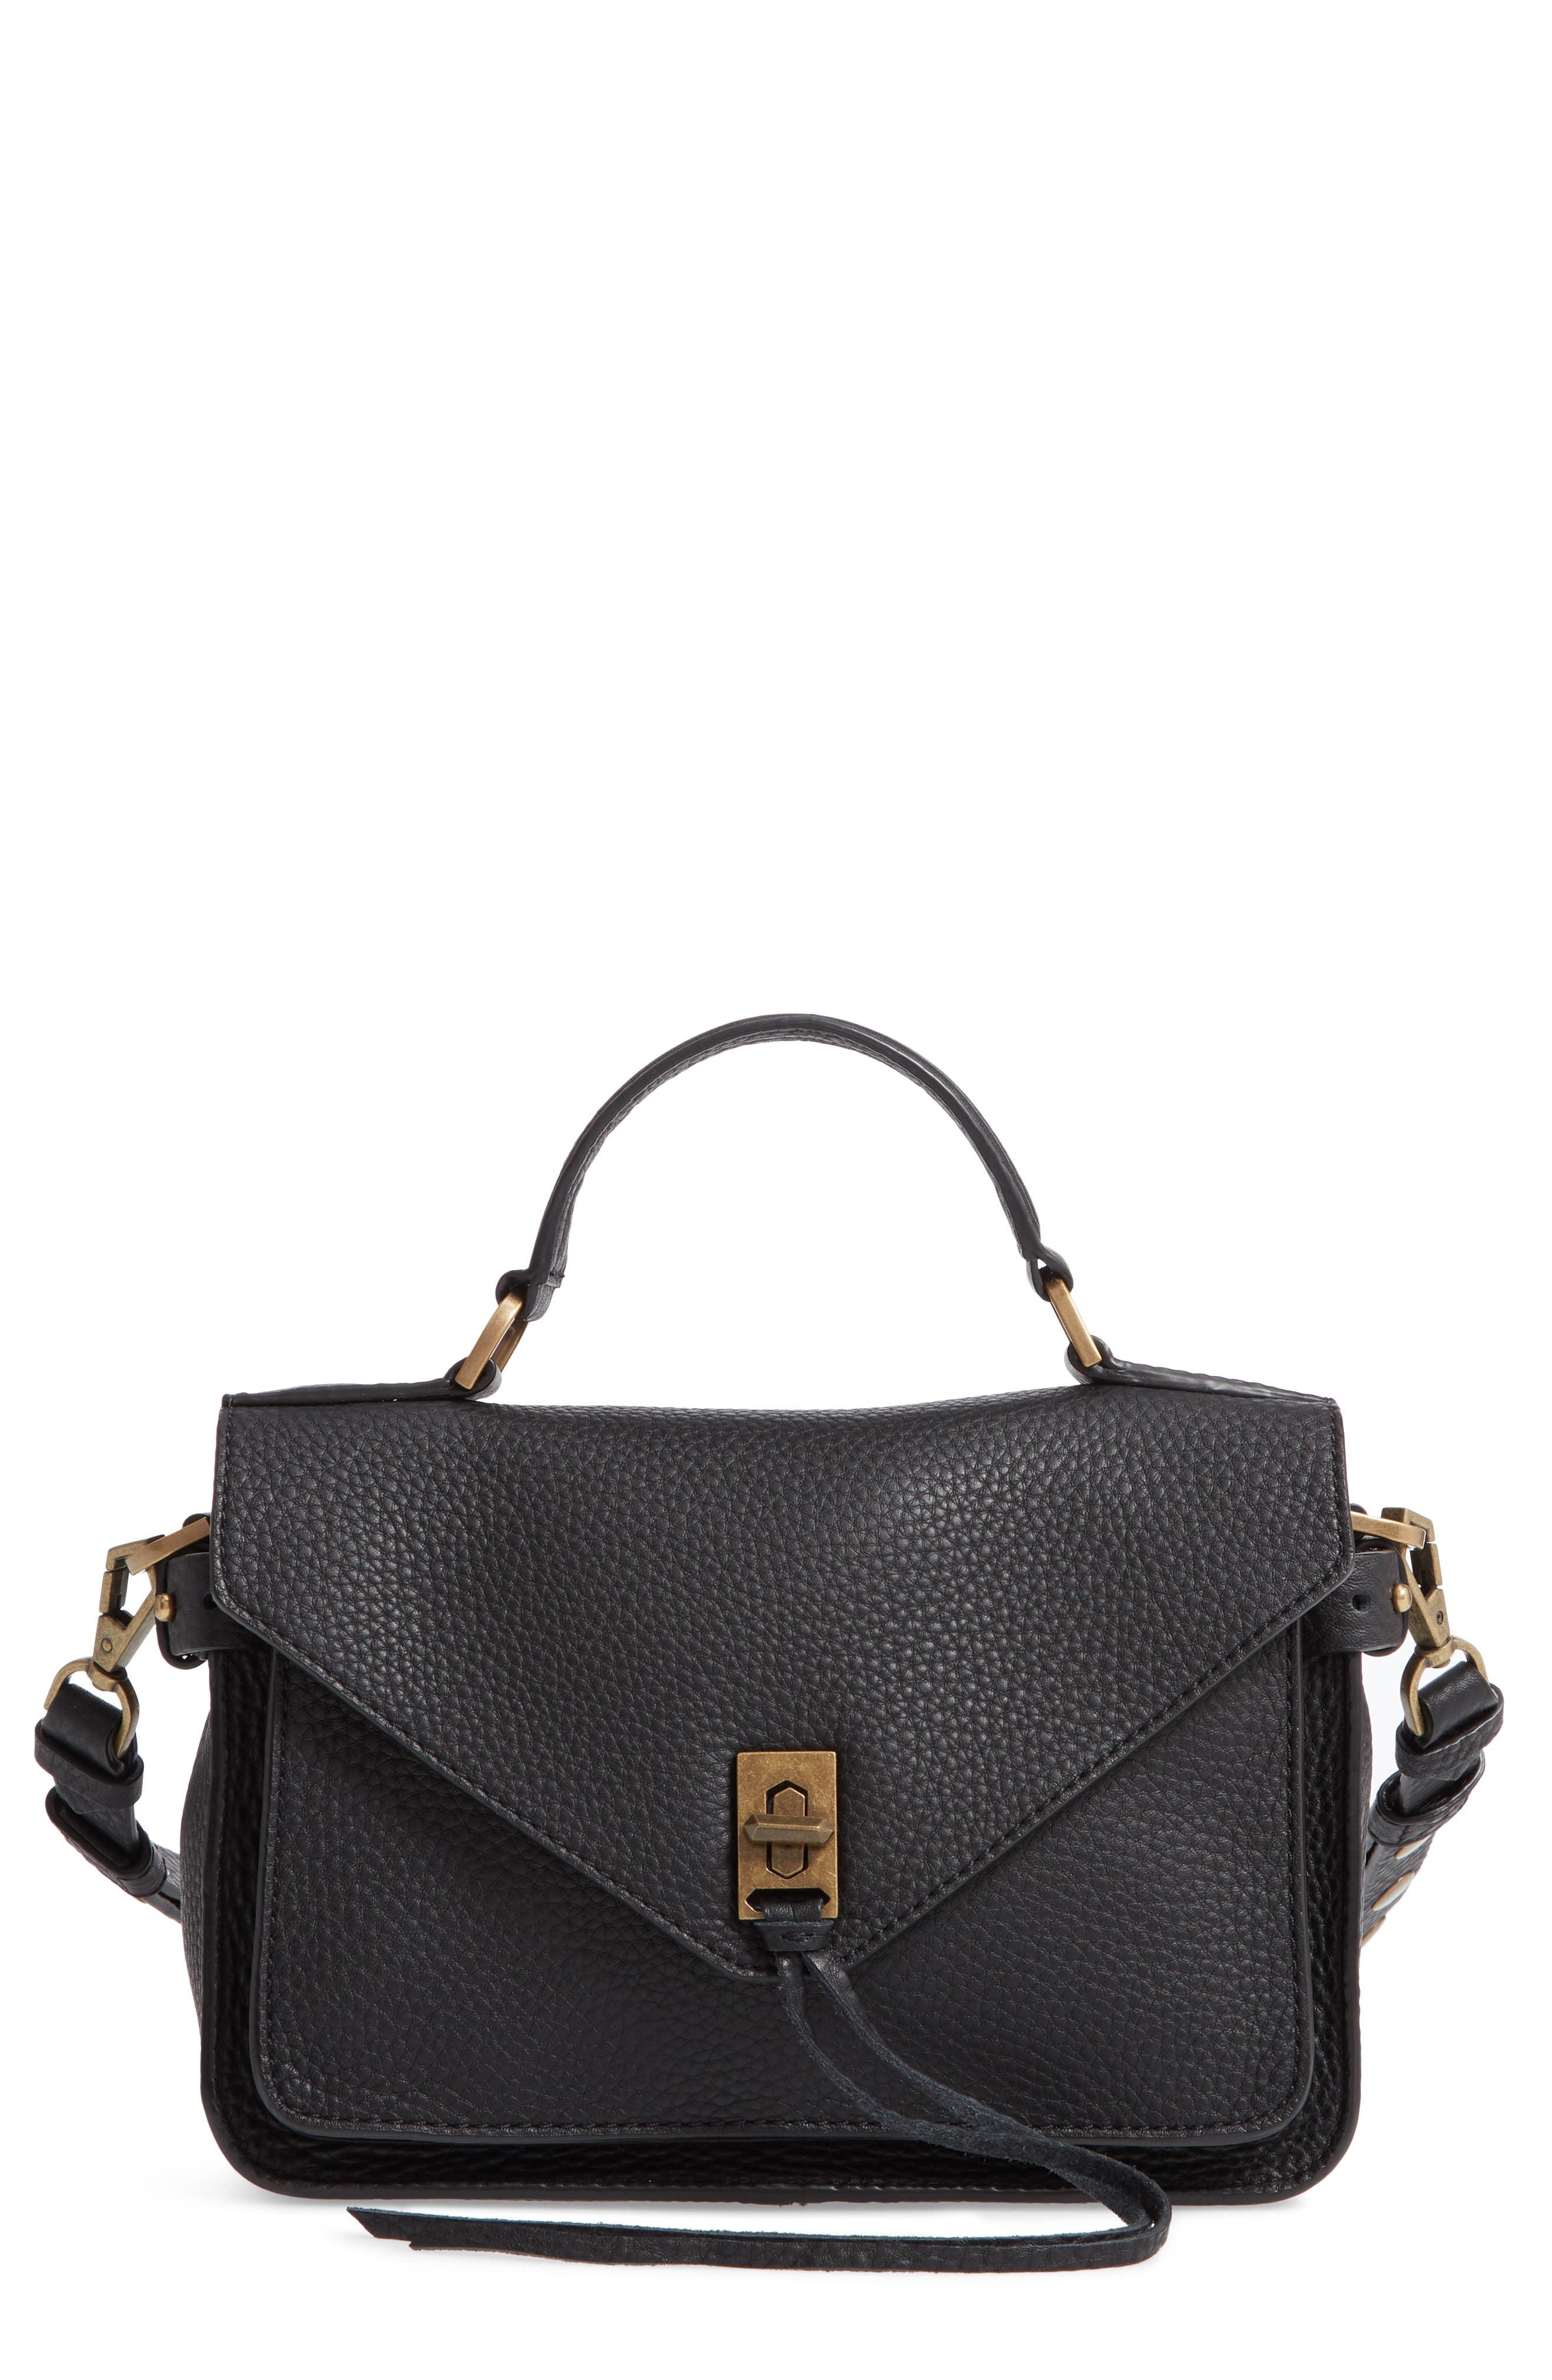 REBECCA MINKOFF 'Small Darren' Leather Messenger Bag, Main, color, BLACK